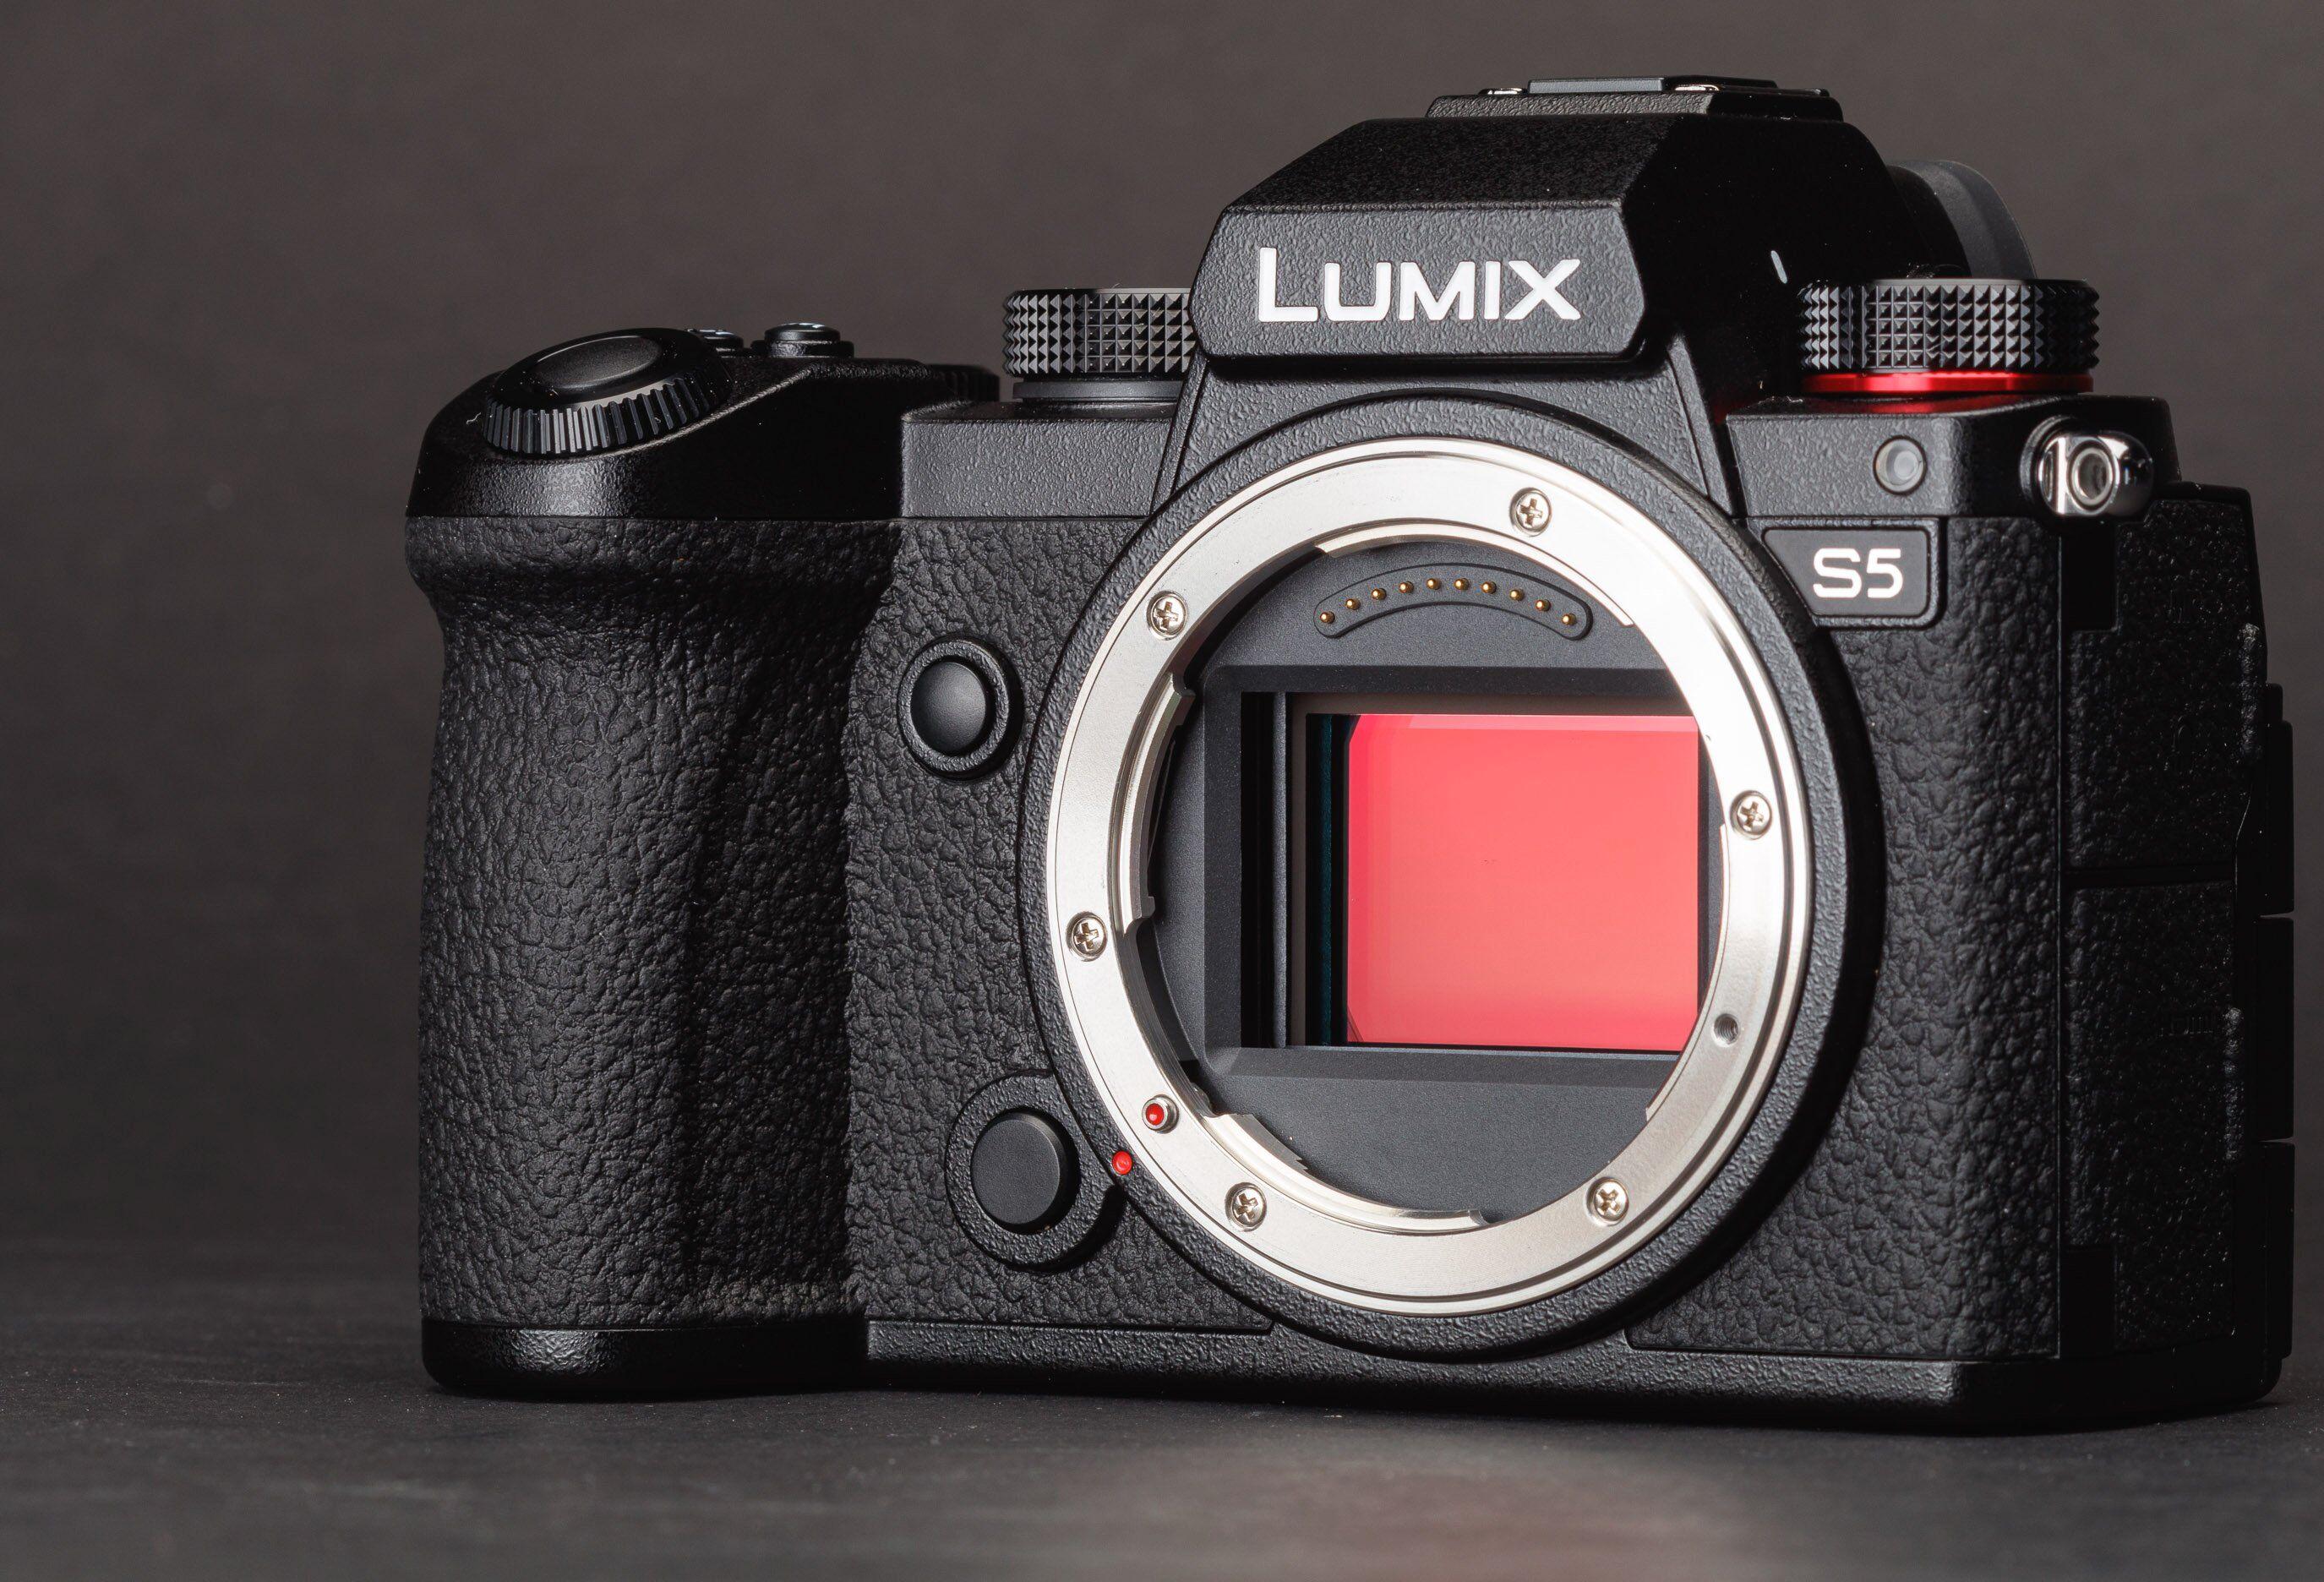 Panasonic Lumix DC-S5 - Cảm biến 24.2MP